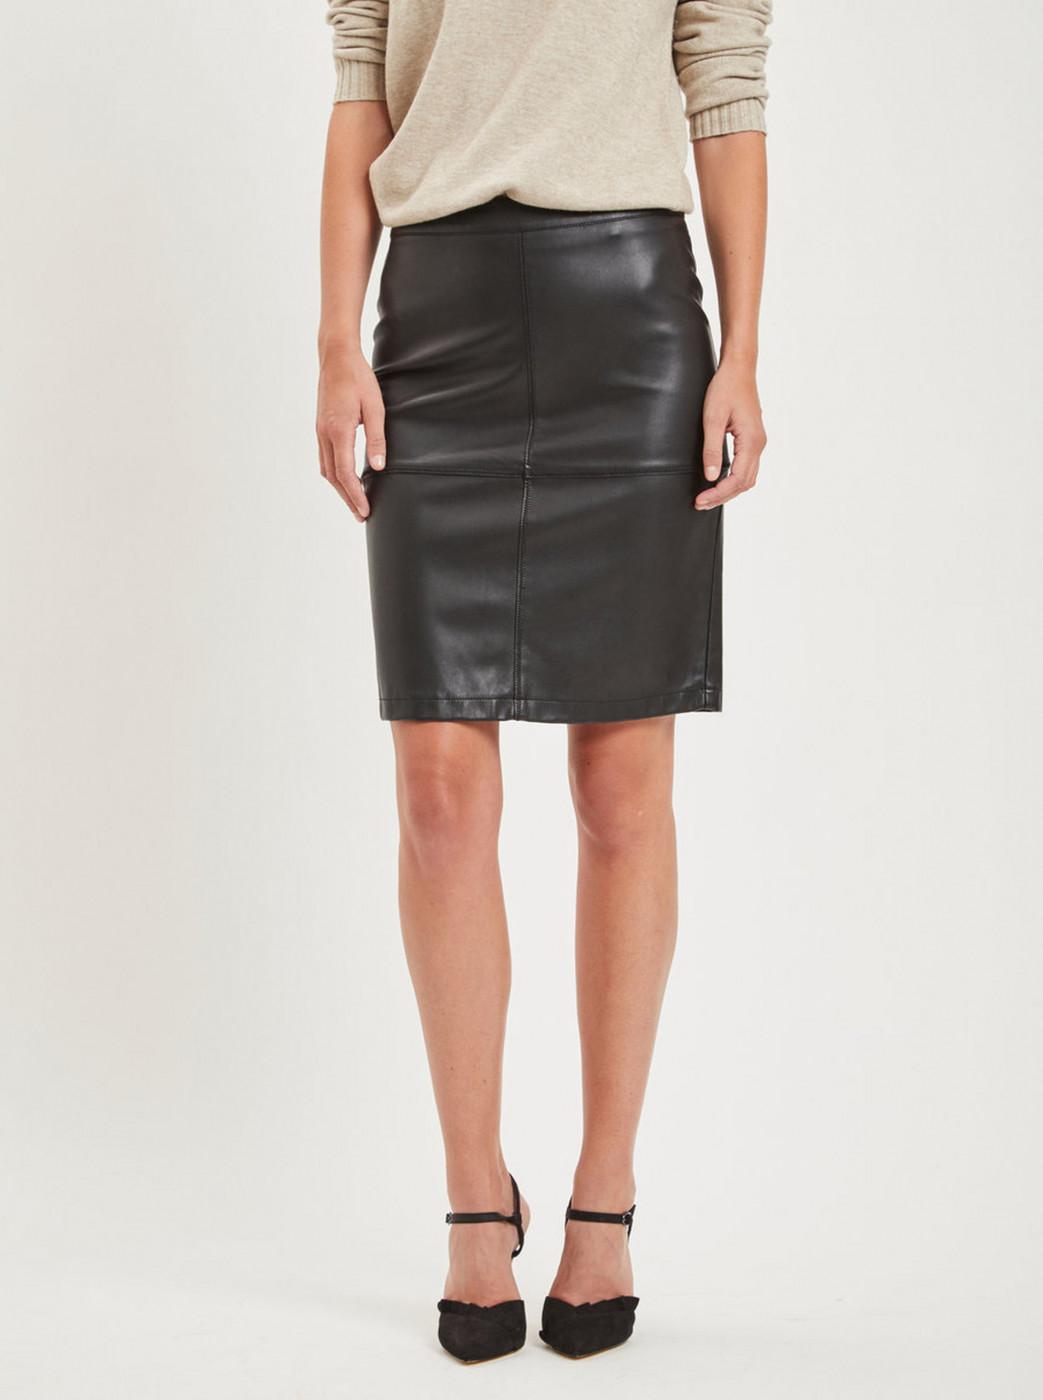 Black leather pencil skirt with slit VILA Pen New